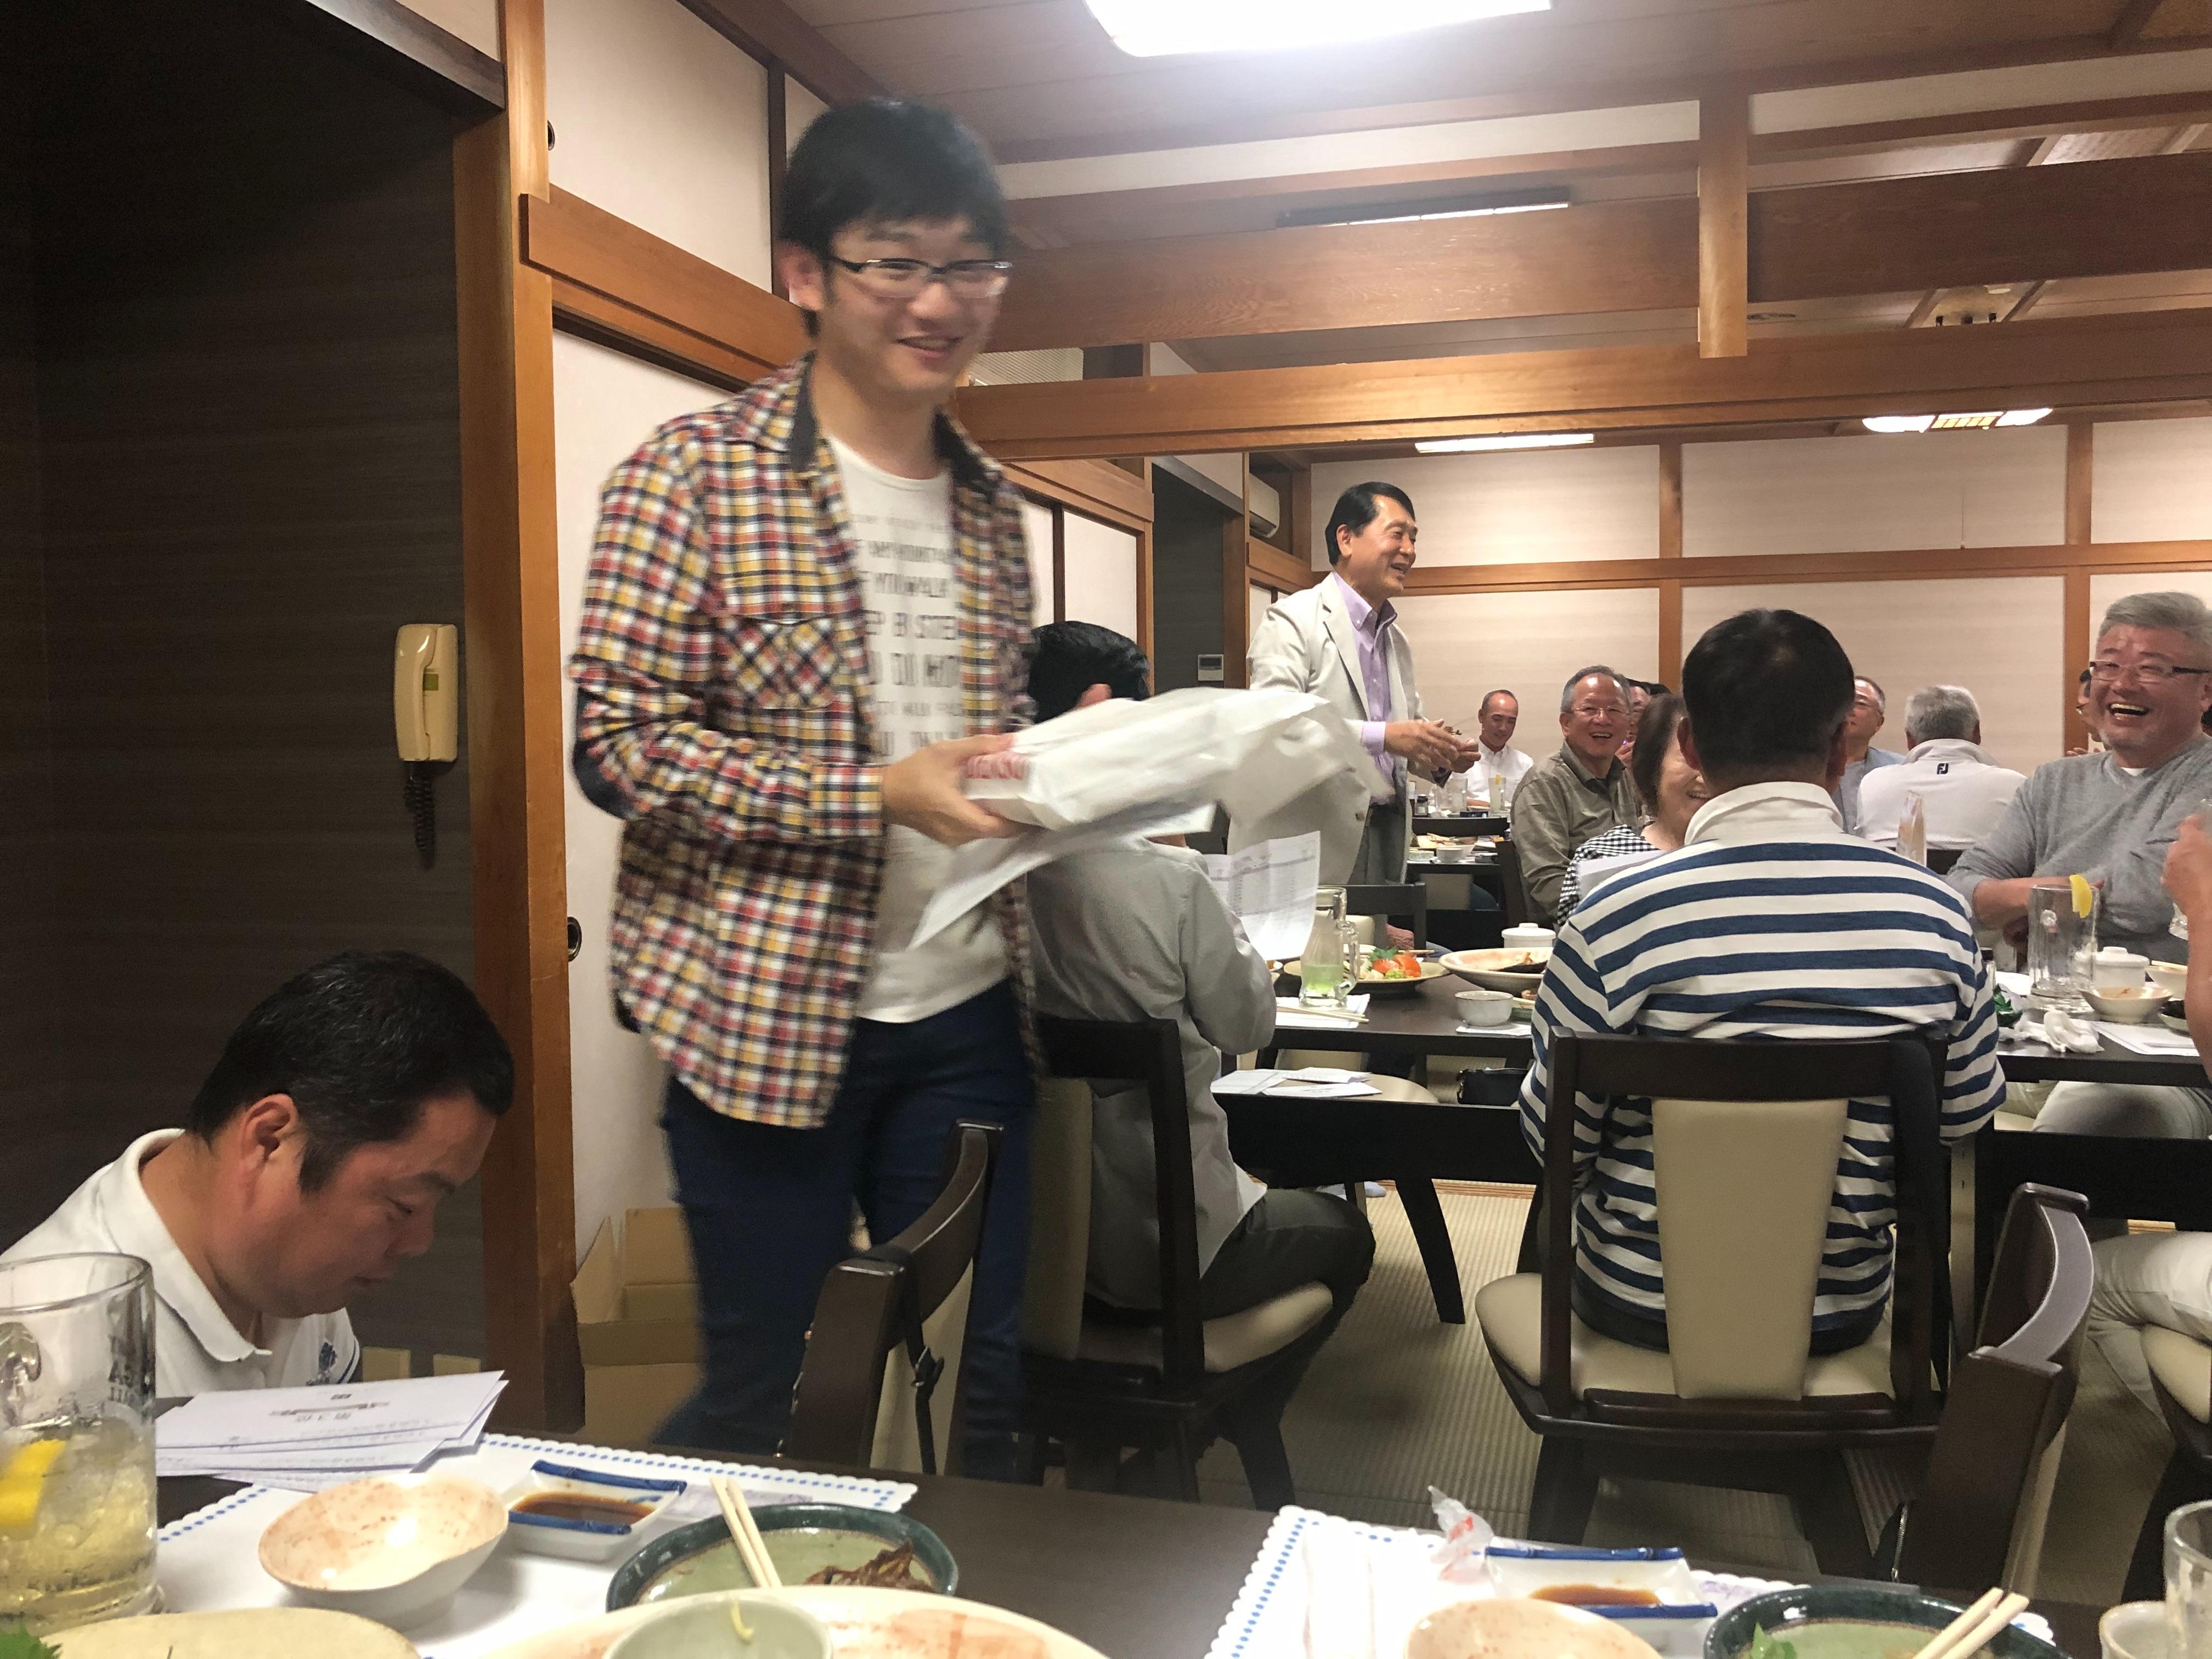 f:id:masanori-kato1972:20190519072356j:image